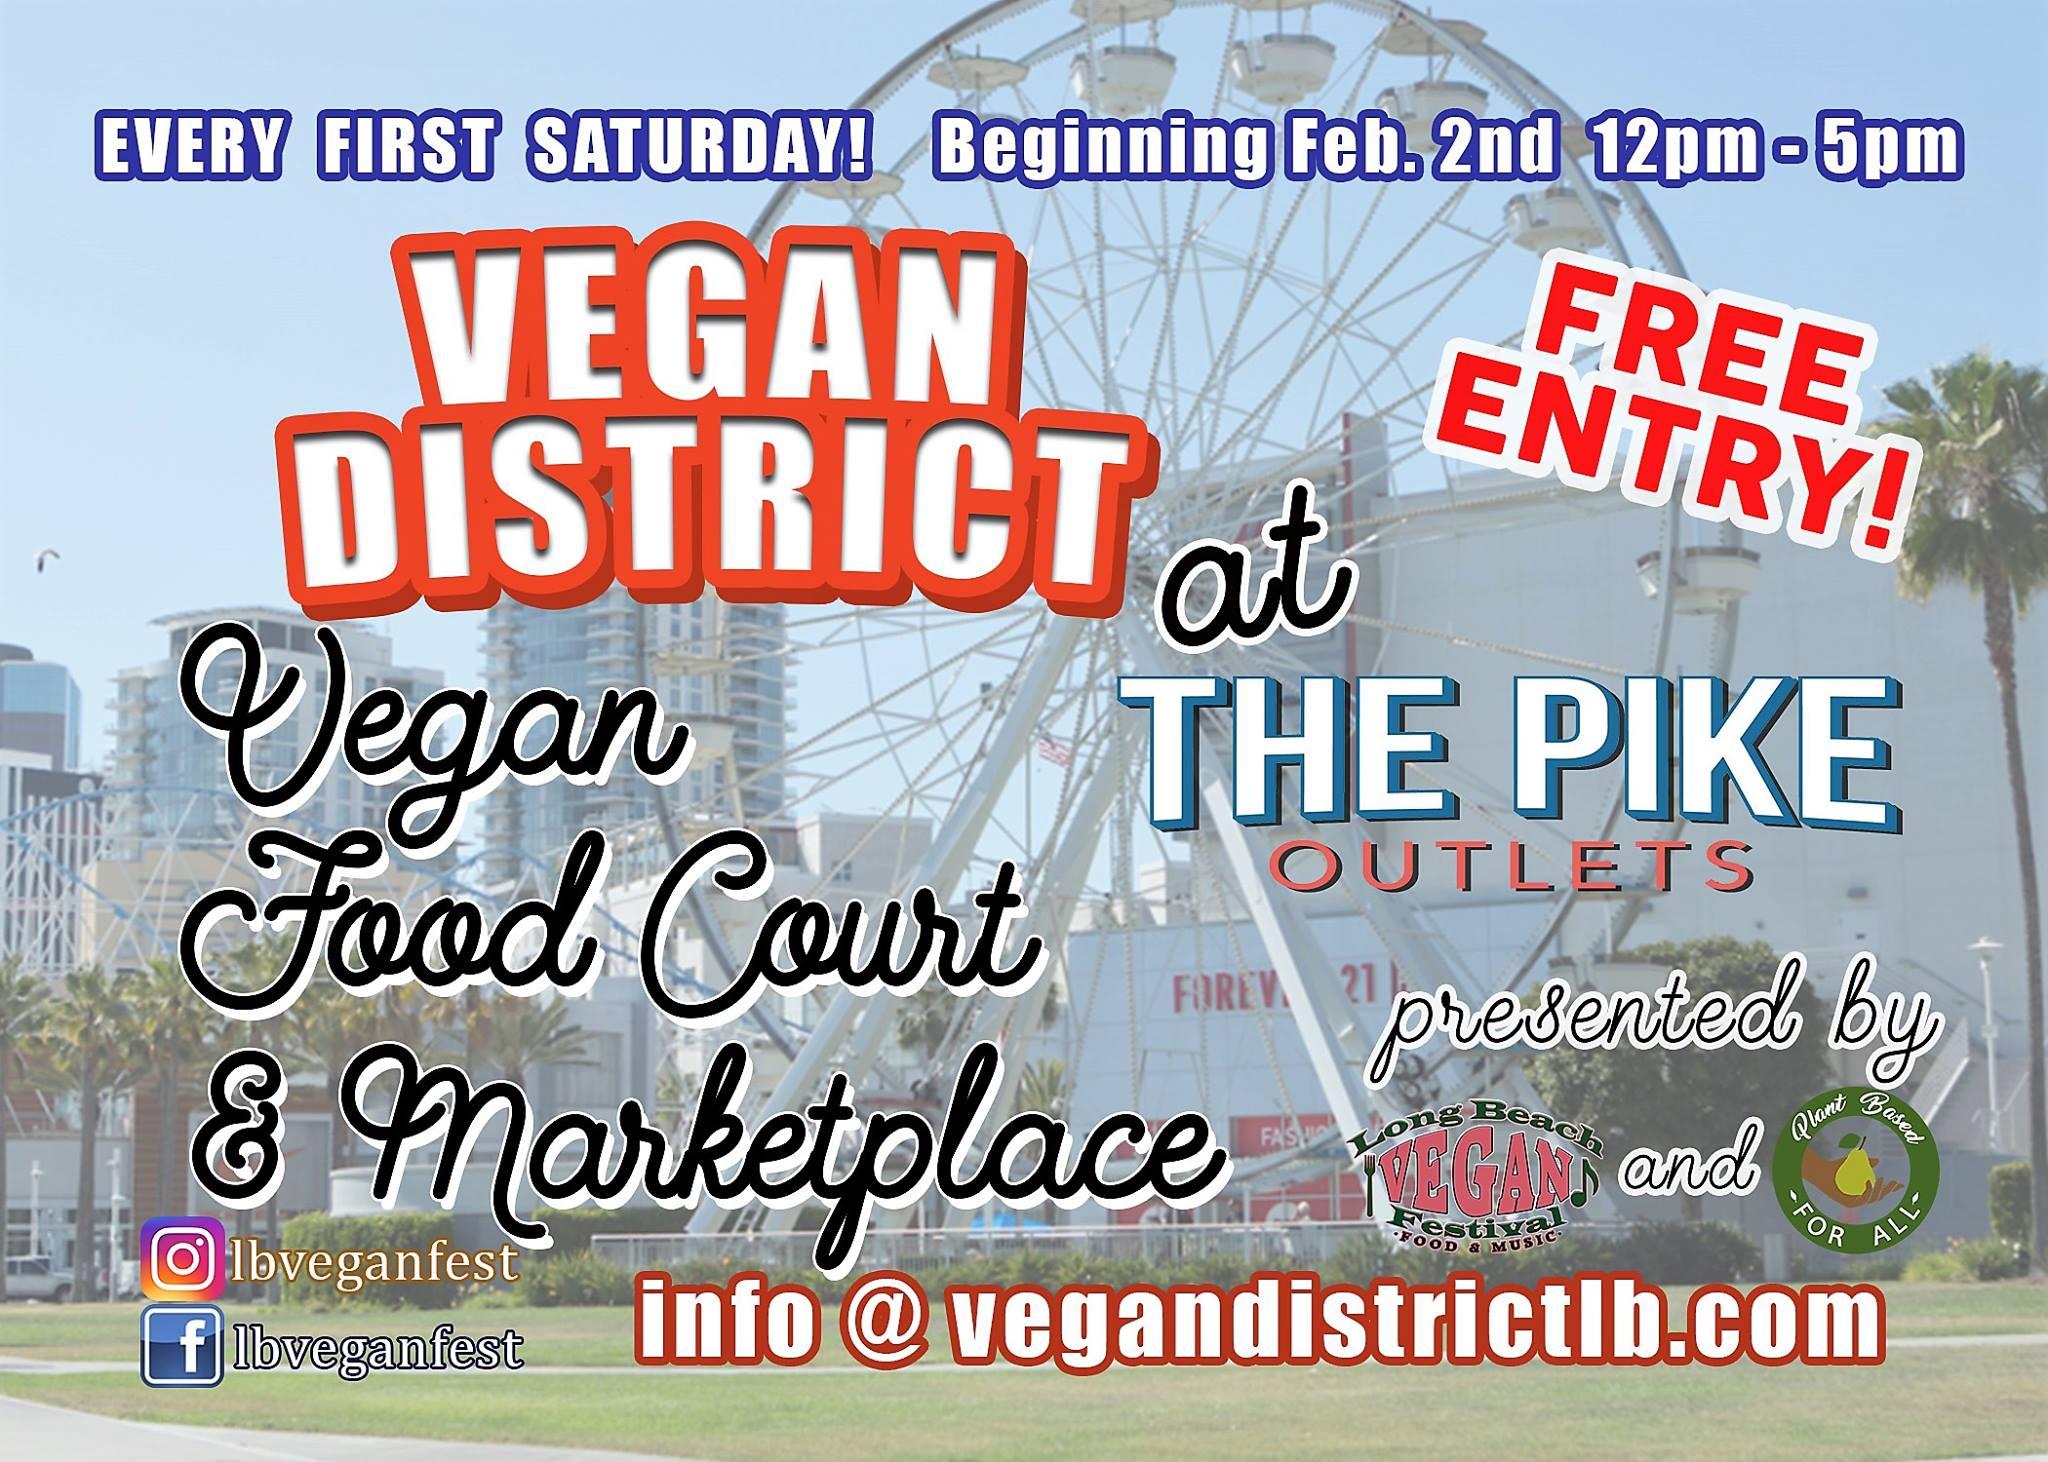 Vegan District at the Pike